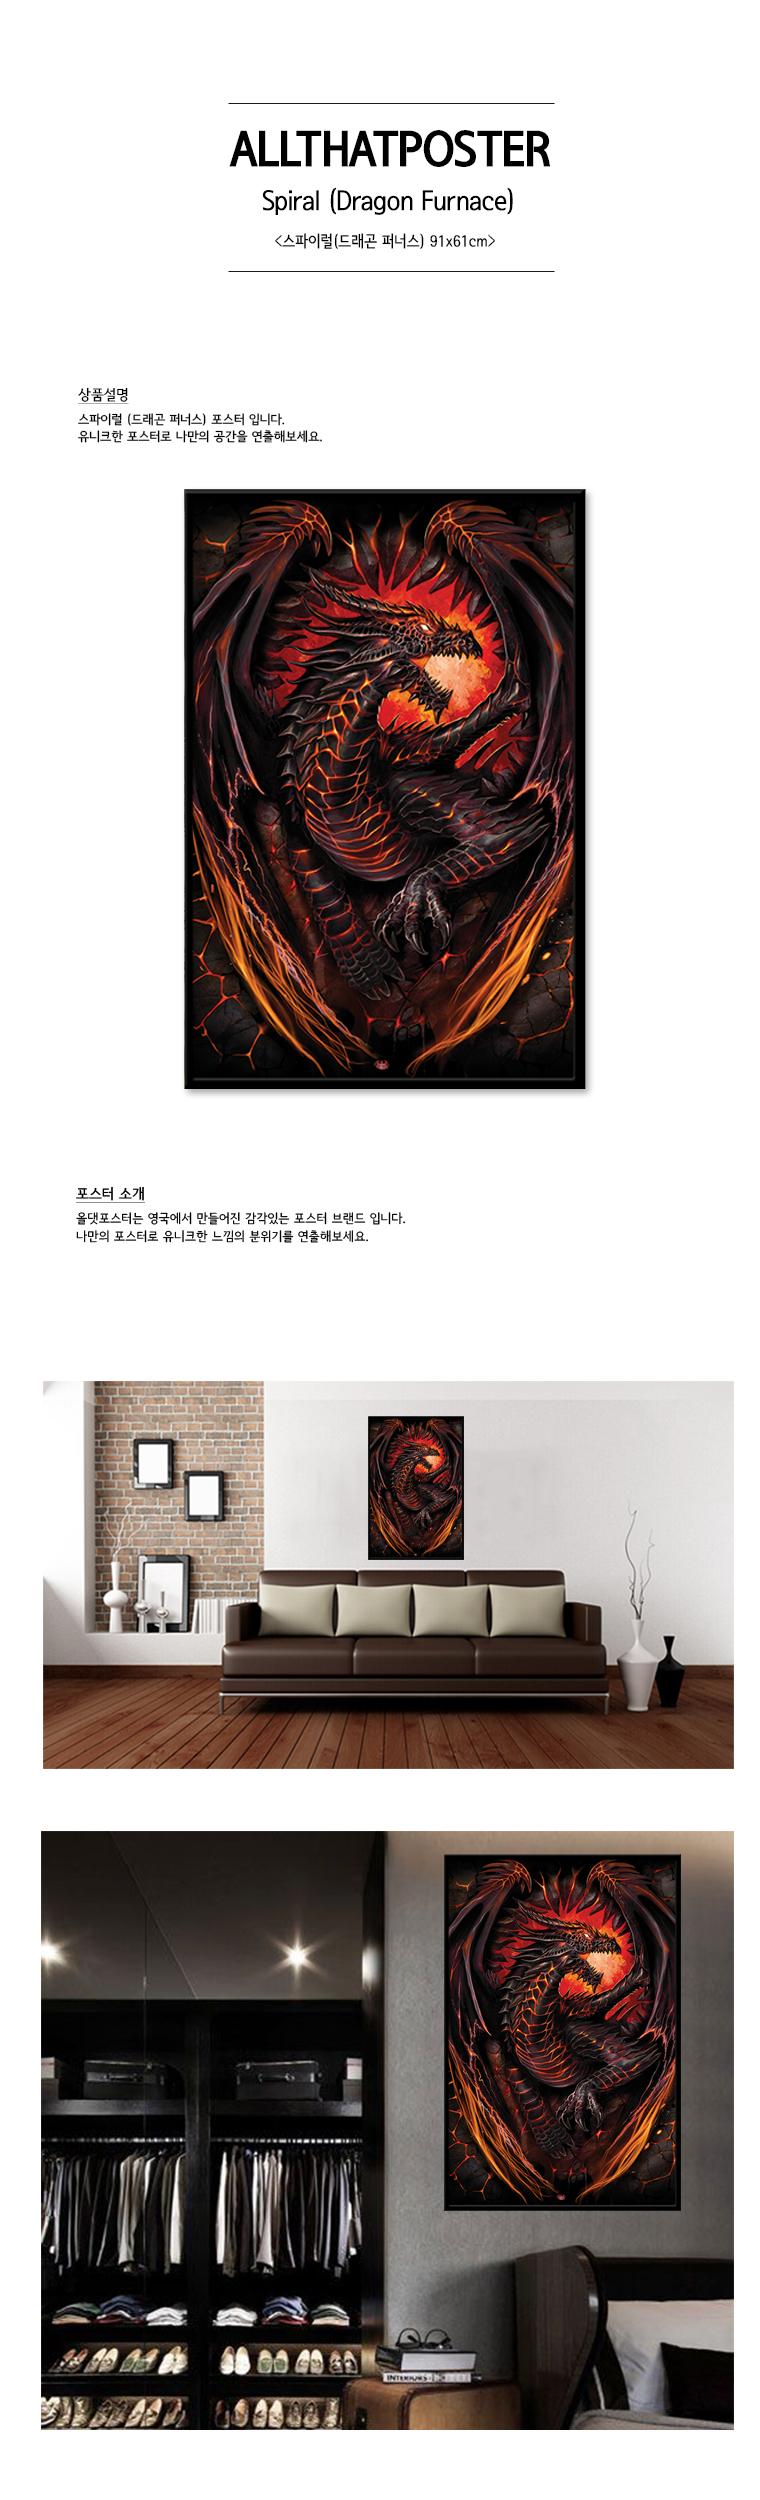 PP33466 Spiral 스파이럴(드래곤 퍼너스)(61x91) - 집잇, 15,000원, 홈갤러리, 포스터